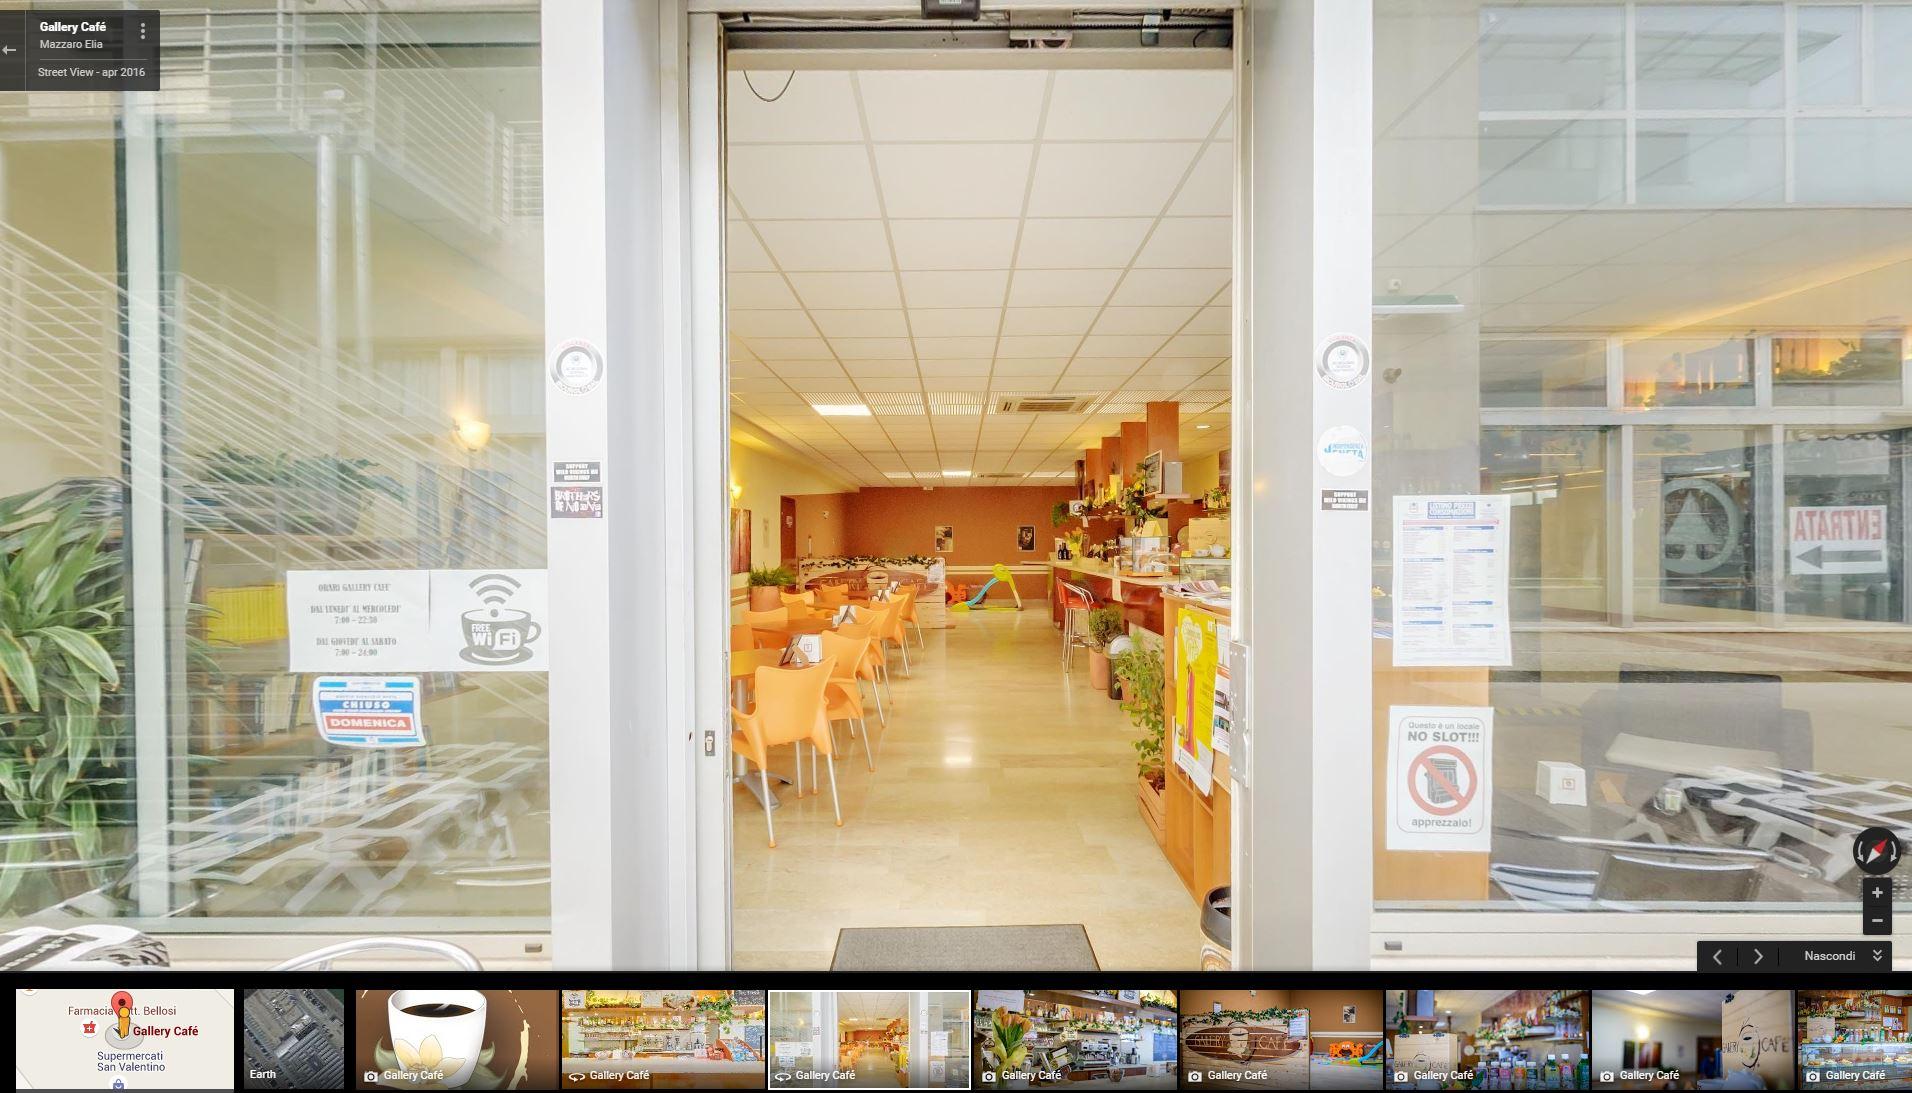 Virtual Tour al gallery café